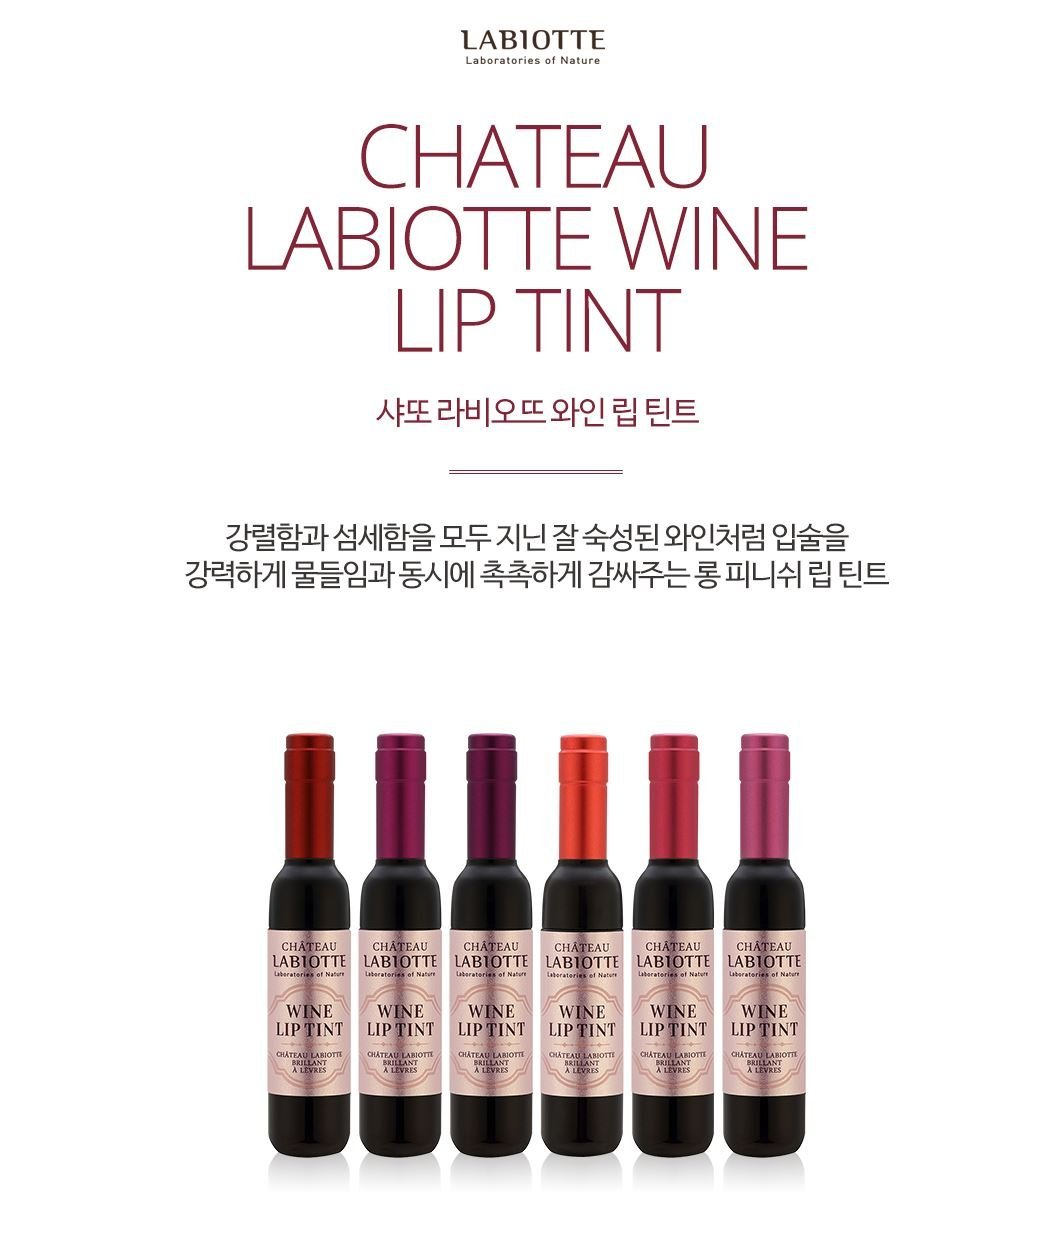 [LABIOTTE] Wine Lip Tint RD01+RD03 (Shiraz Red+Merlot Burgundy) 7g 2 pcs Set